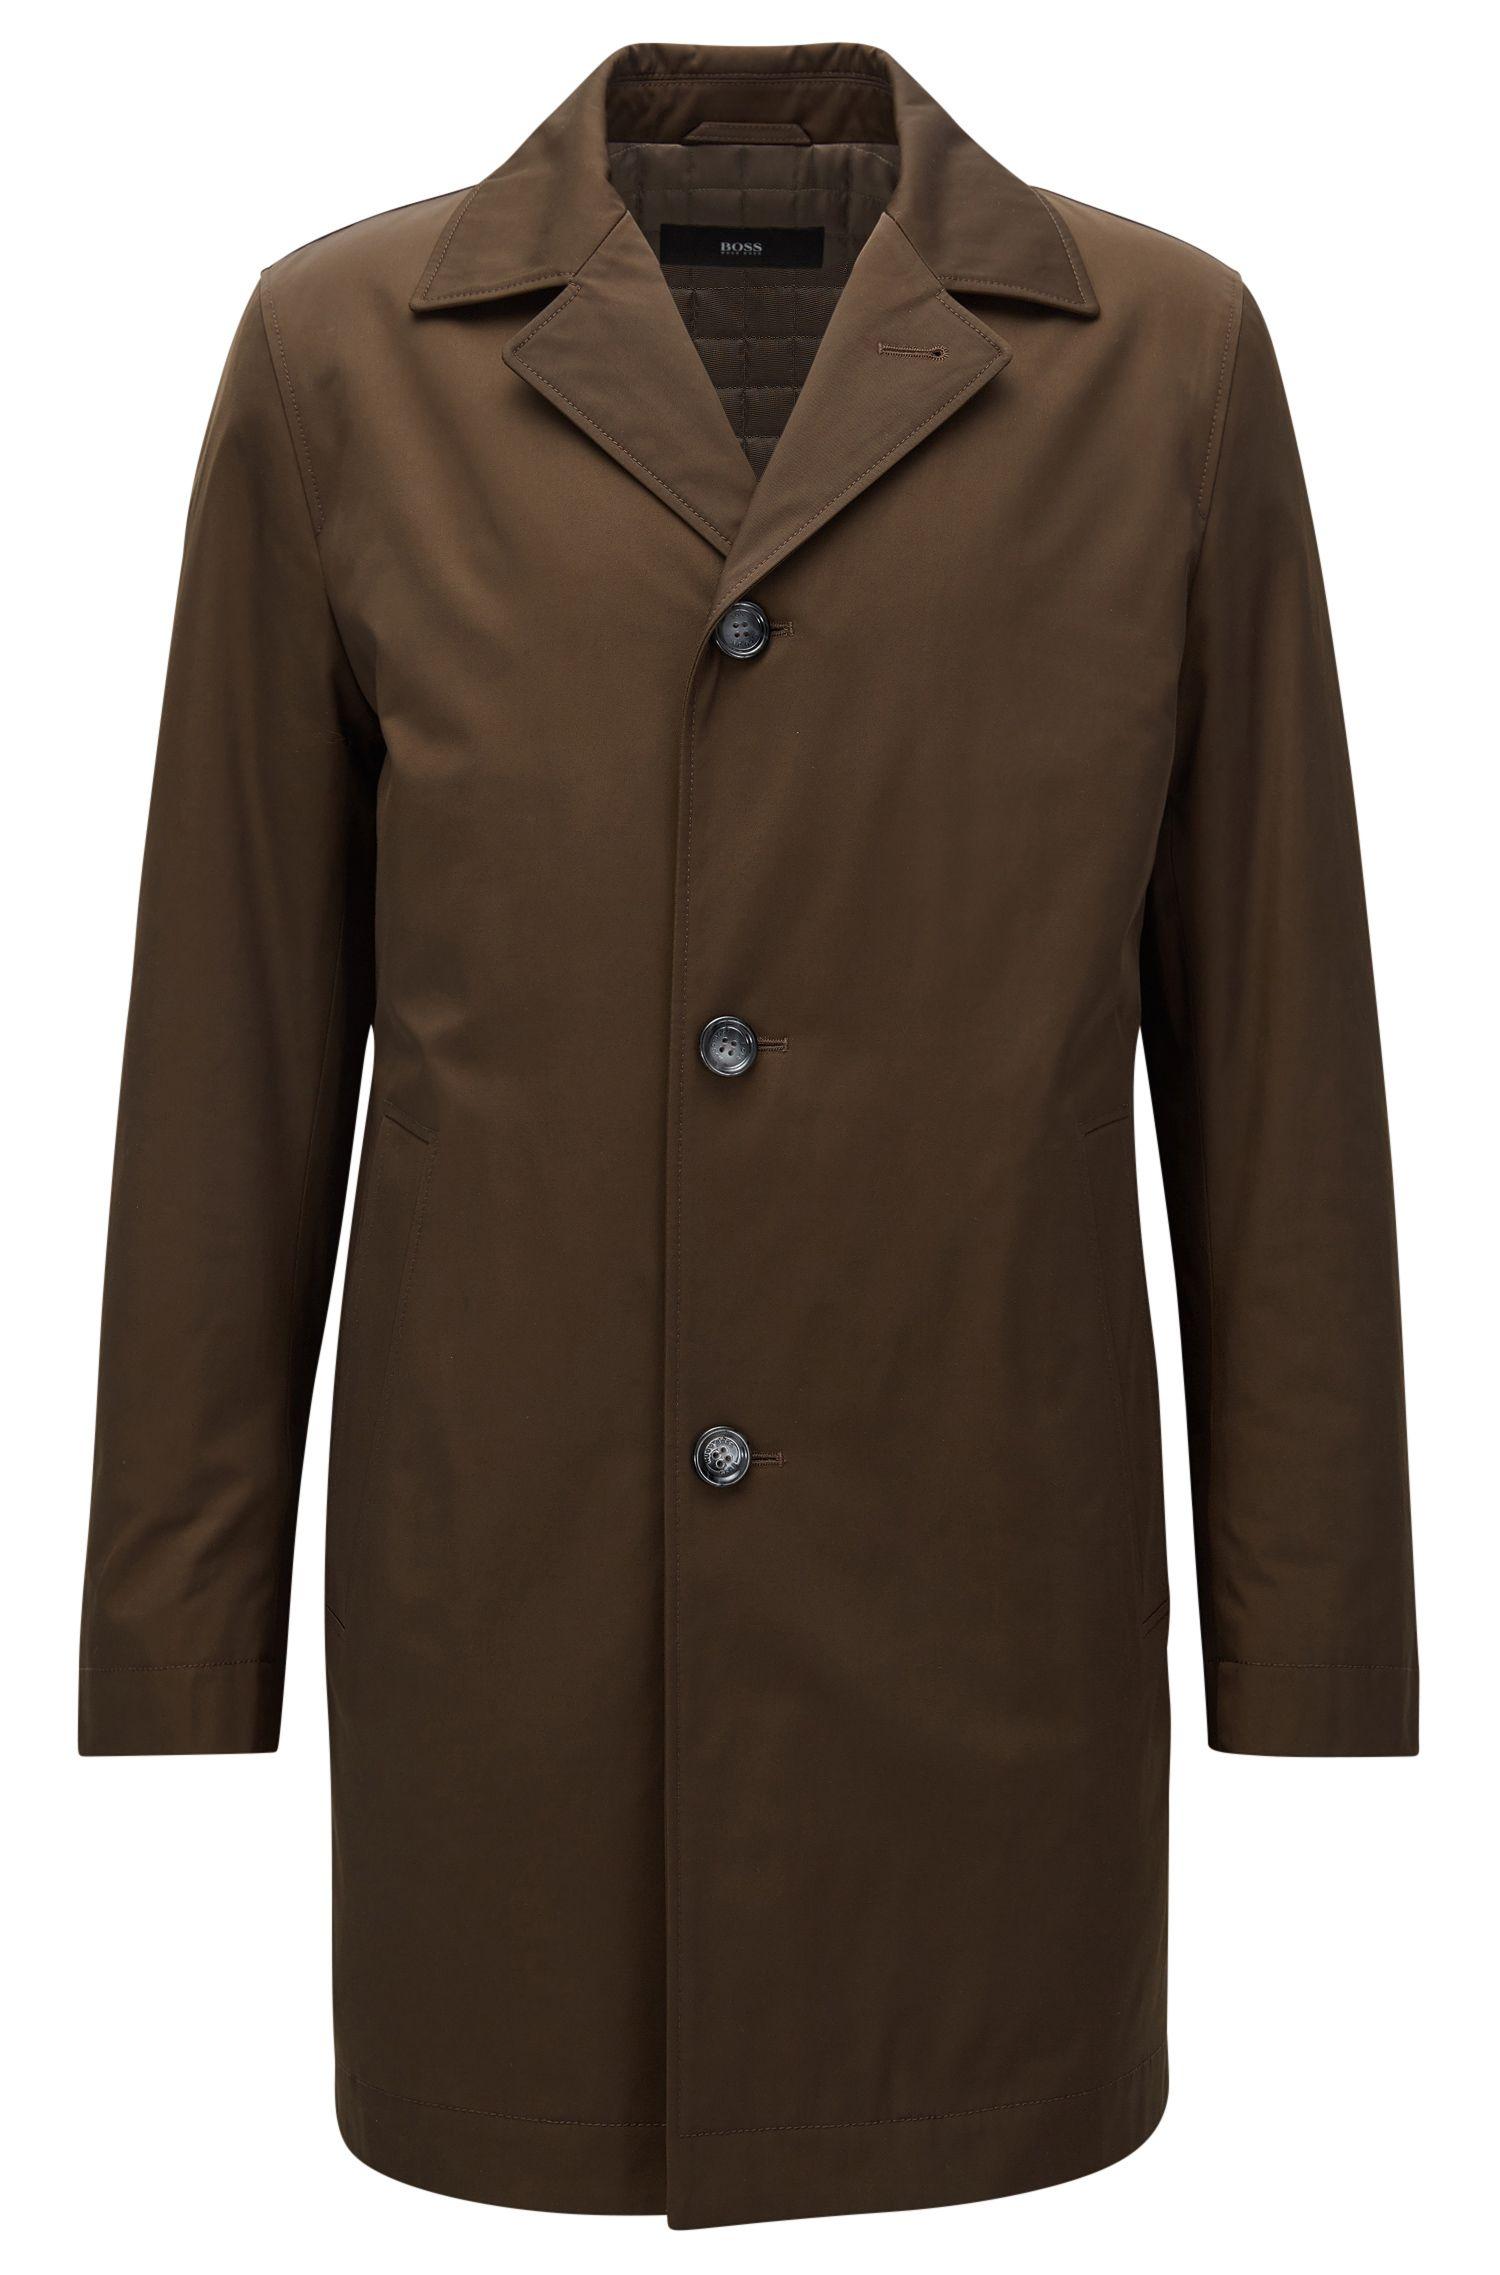 Abrigo ligeramente acolchado en tejido de peso medio